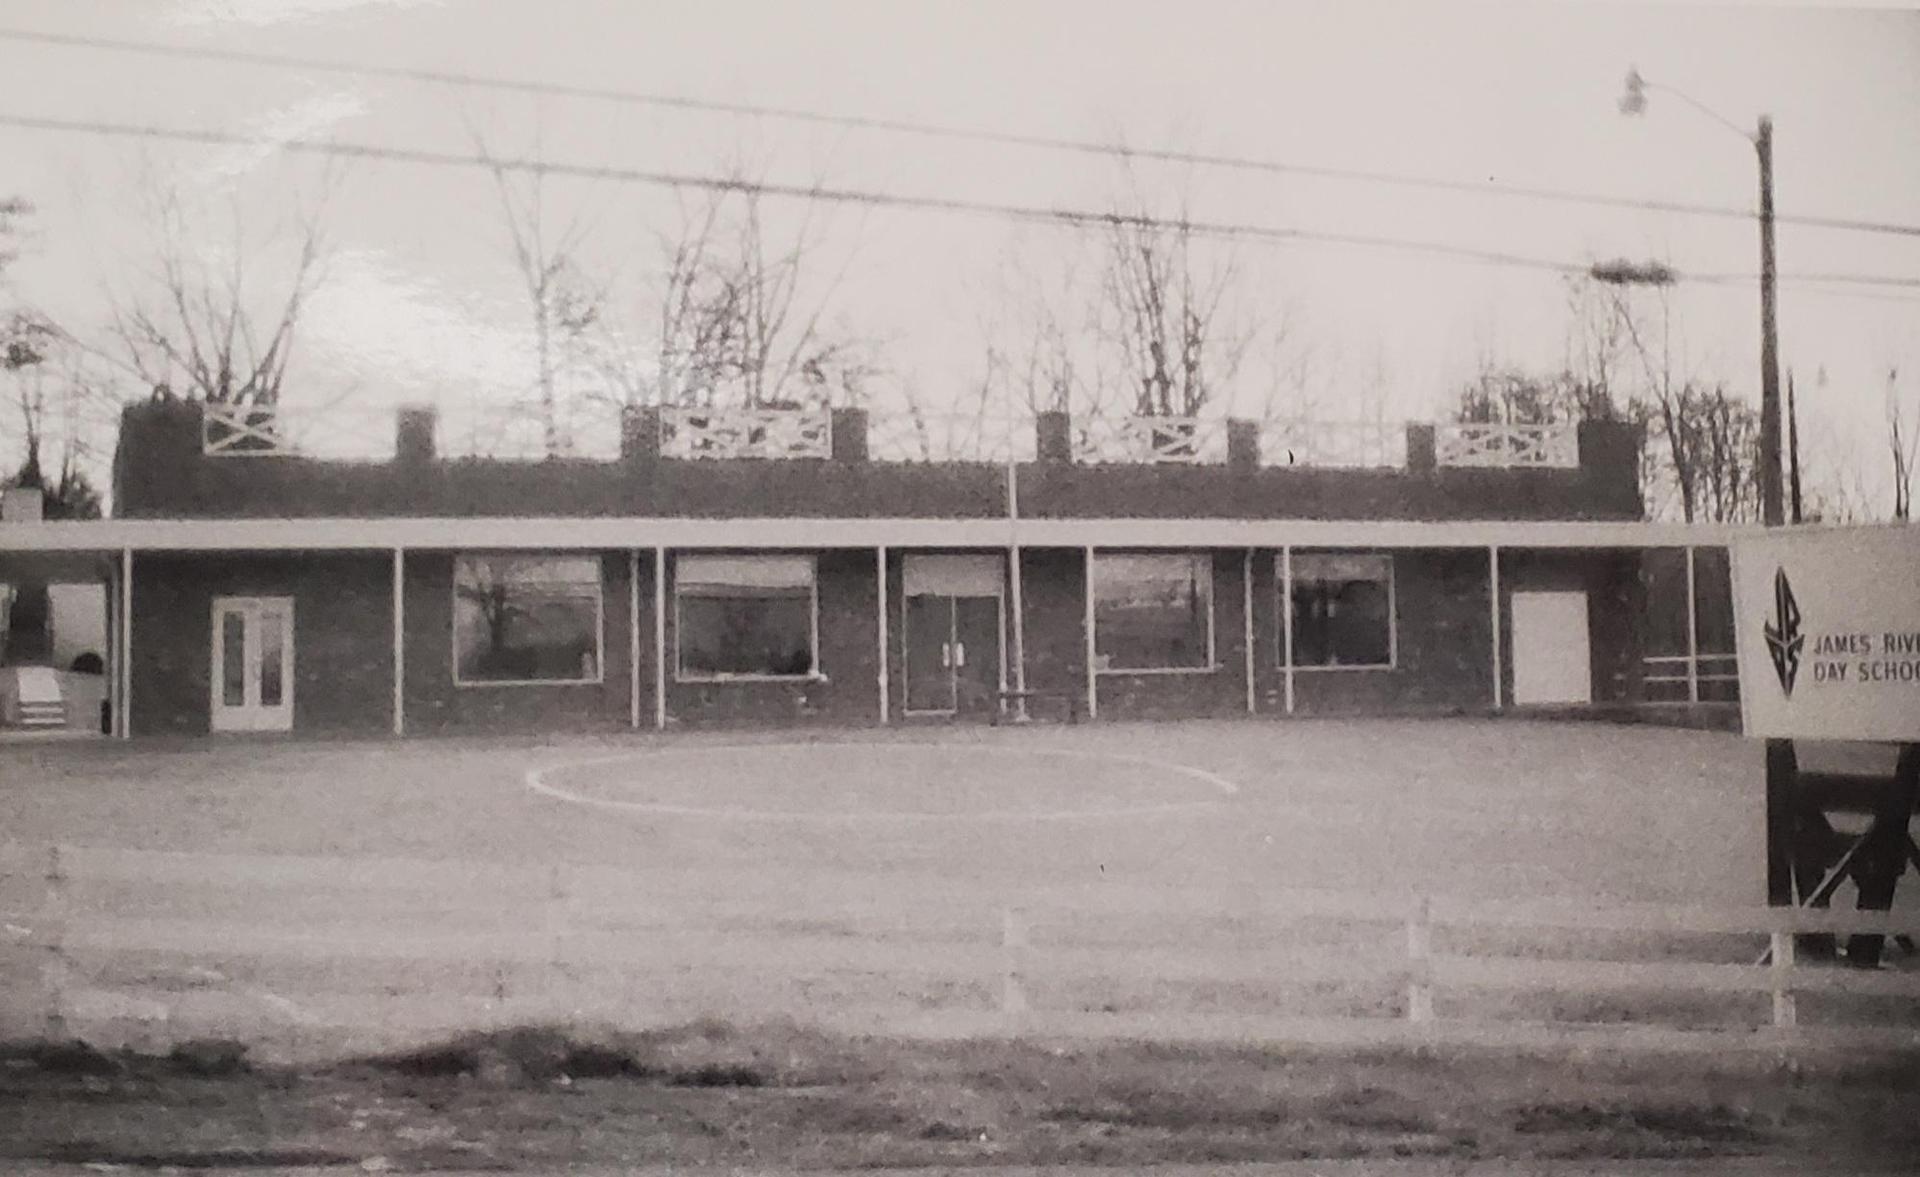 James River's original school building